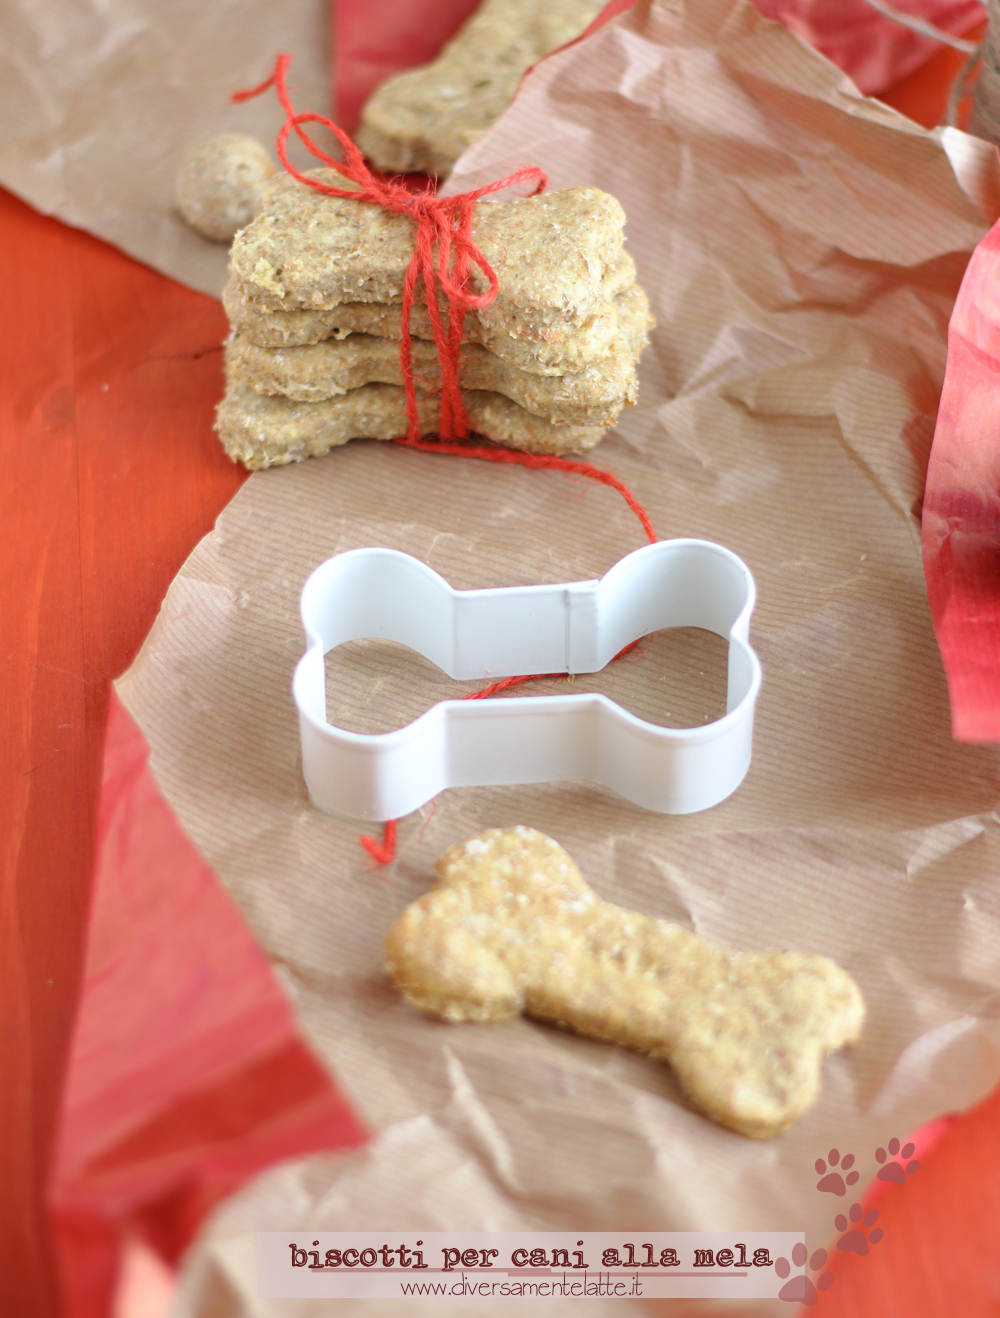 biscotti per cane homemade